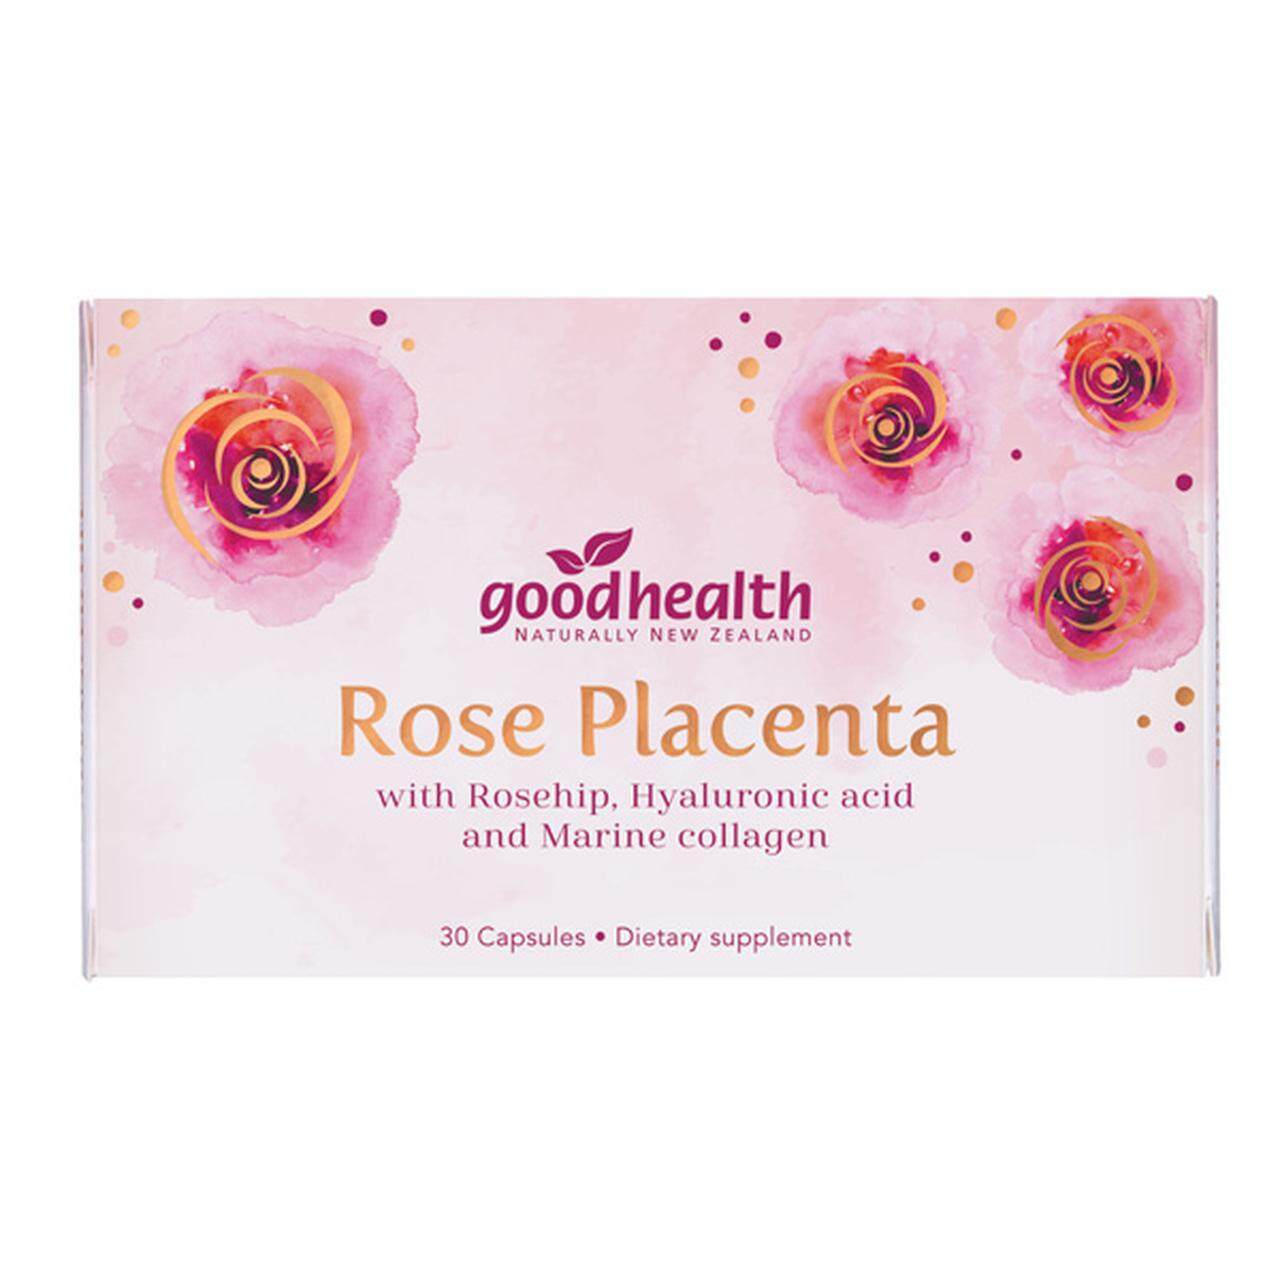 GOOD HEALTH Rose Placenta 30 capsules